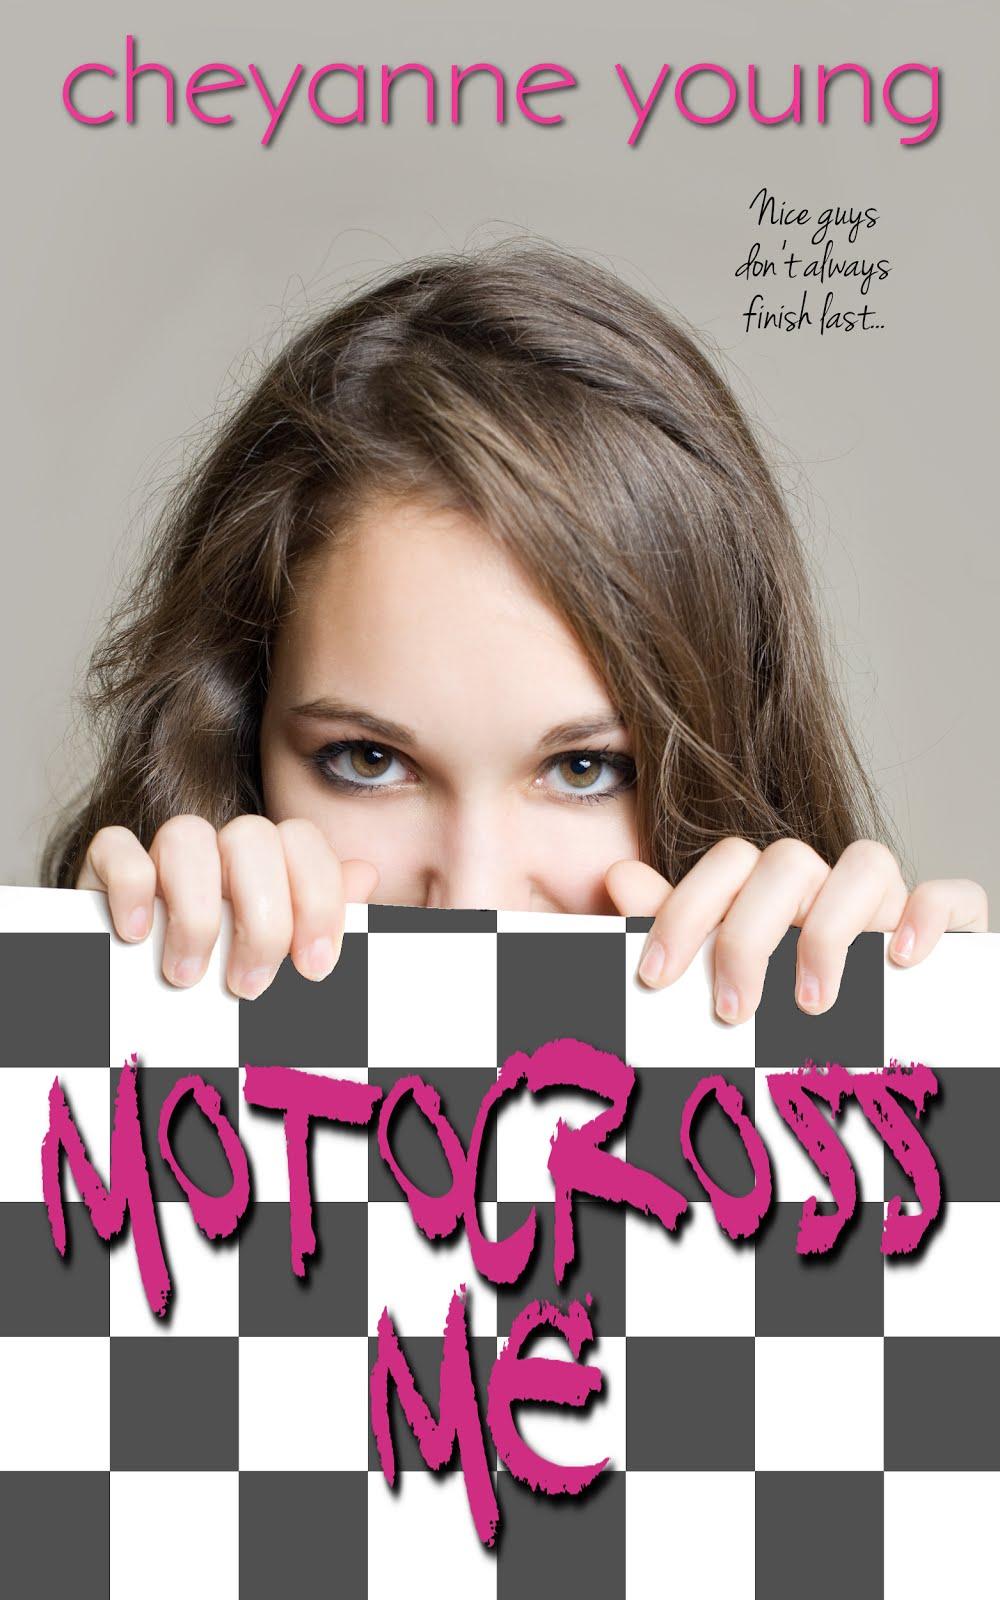 MOTOCROSS ME